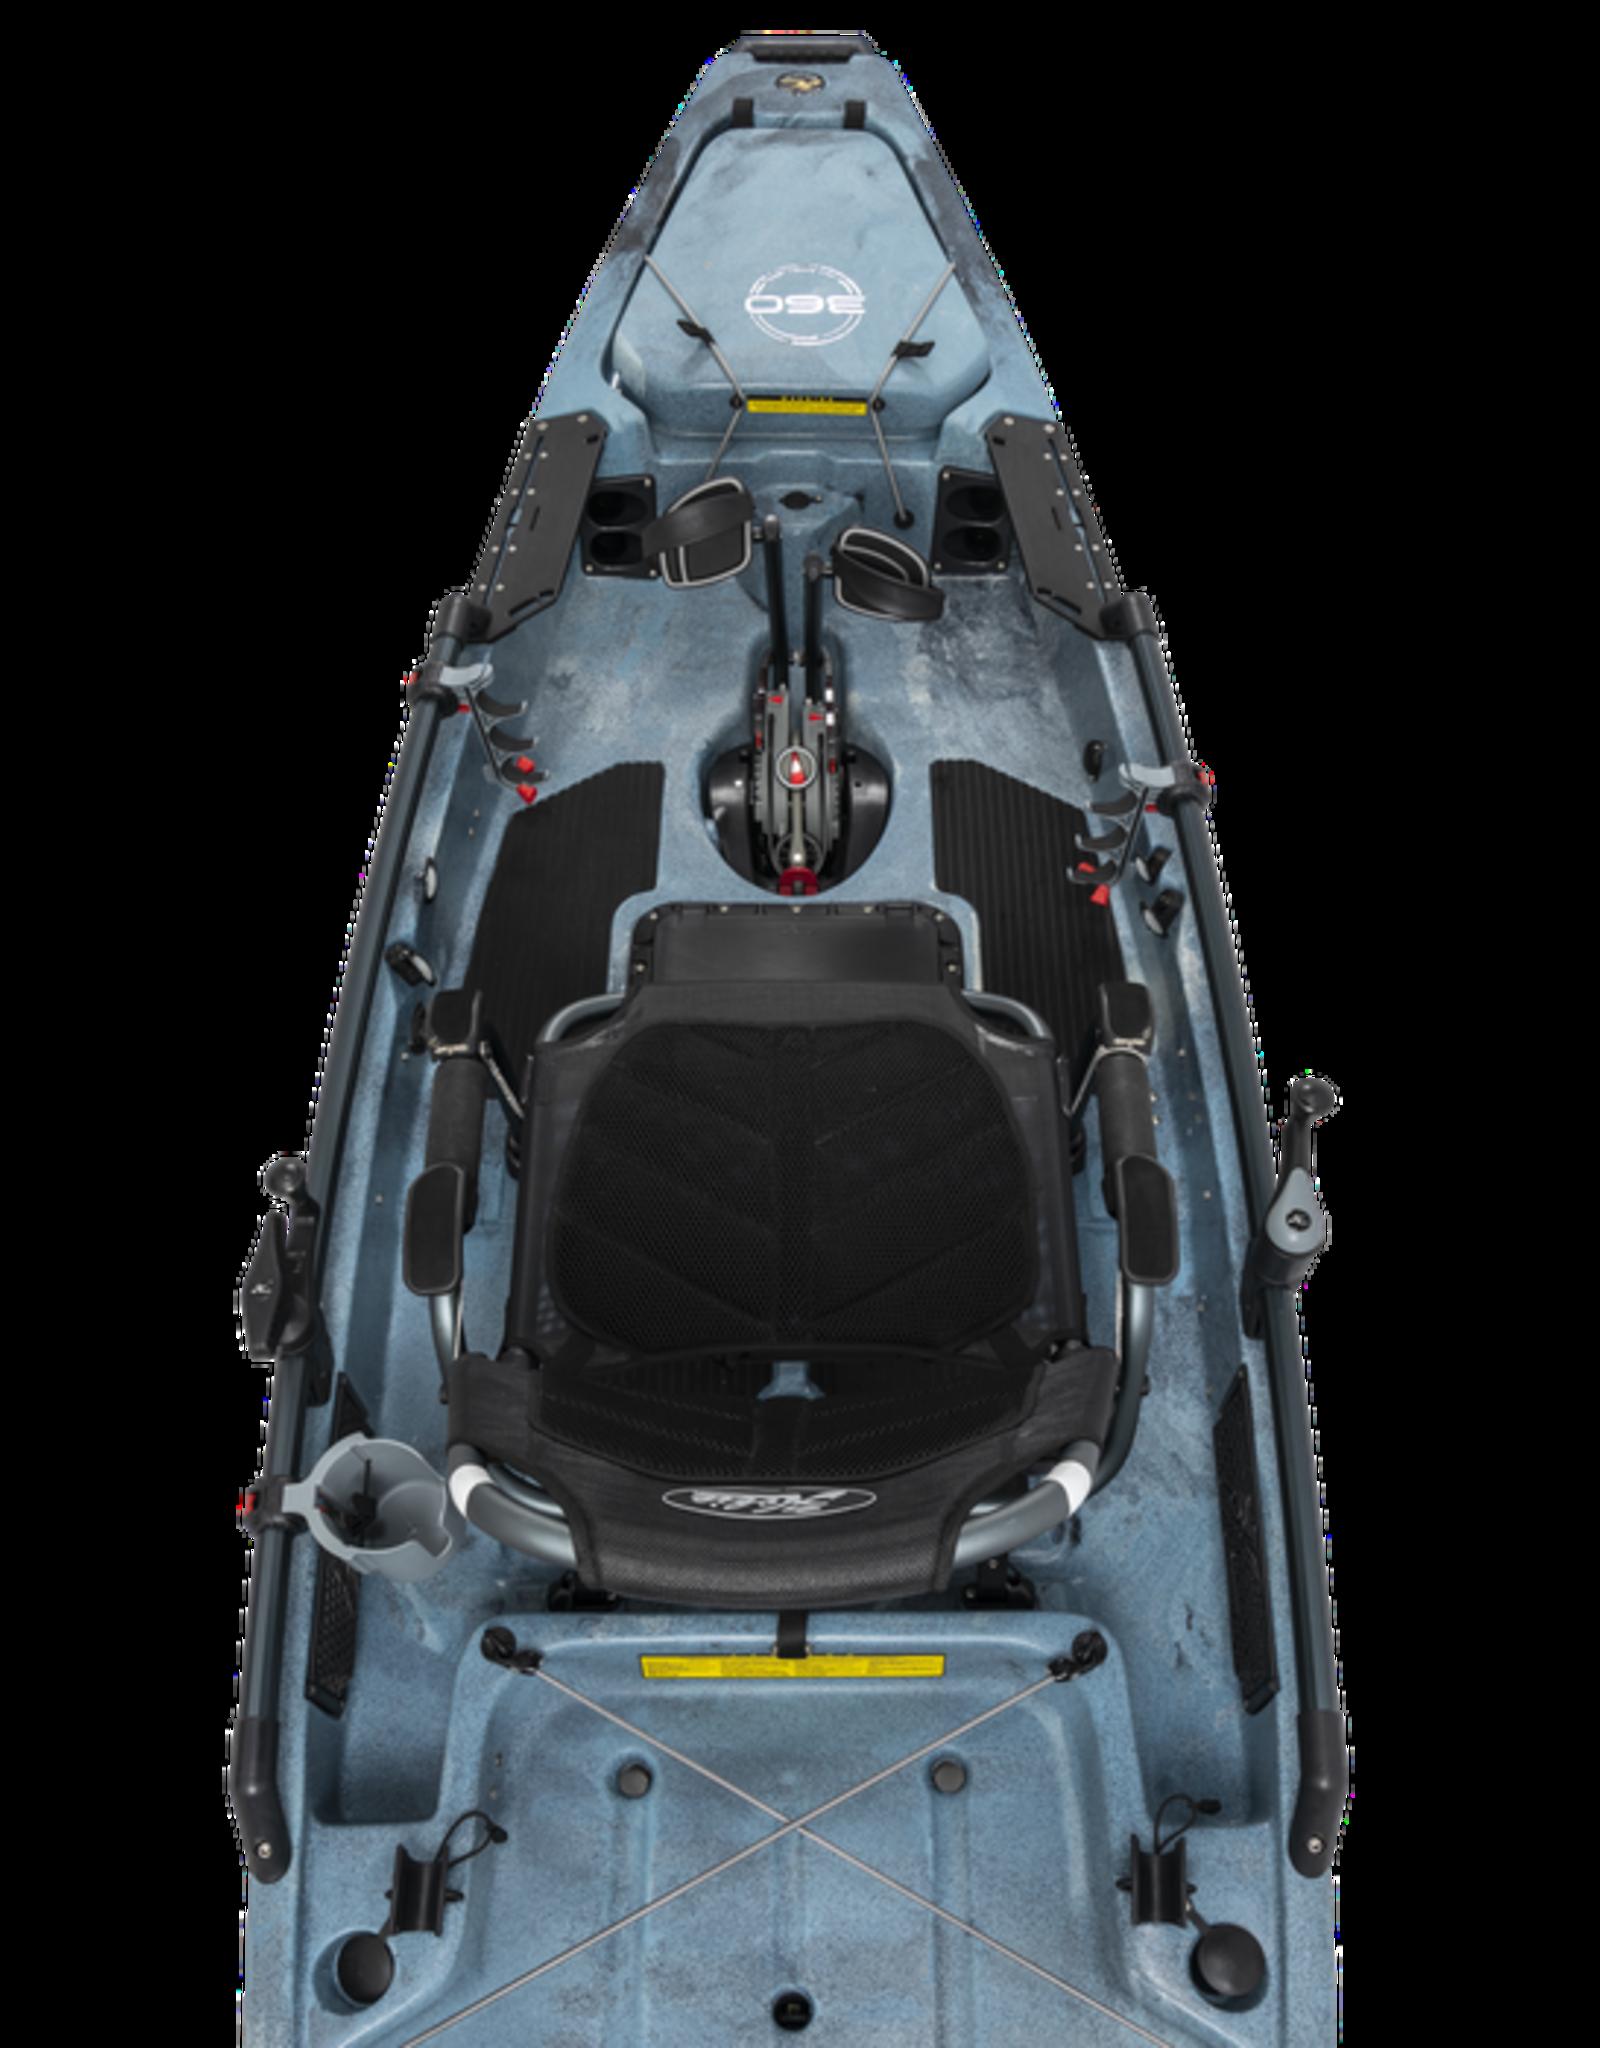 Hobie Hobie kayak Pro Angler 12 MirageDrive 360 Kick-Up Fin